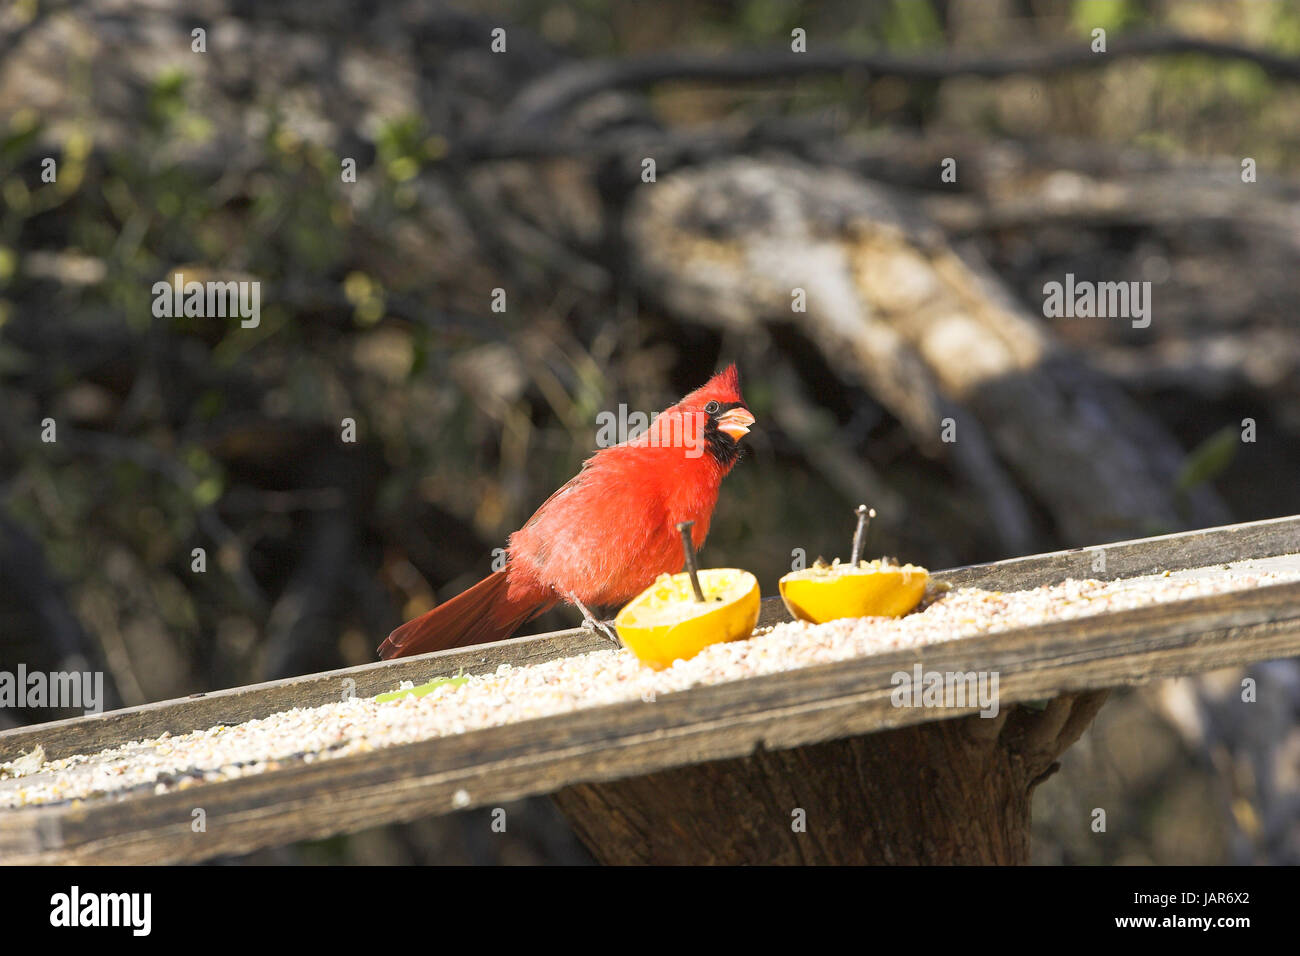 Northern Cardinal Cardinalis Cardinalis At Bird Table Feeder Salineno Lower Rio  Grande Valley Texas USA